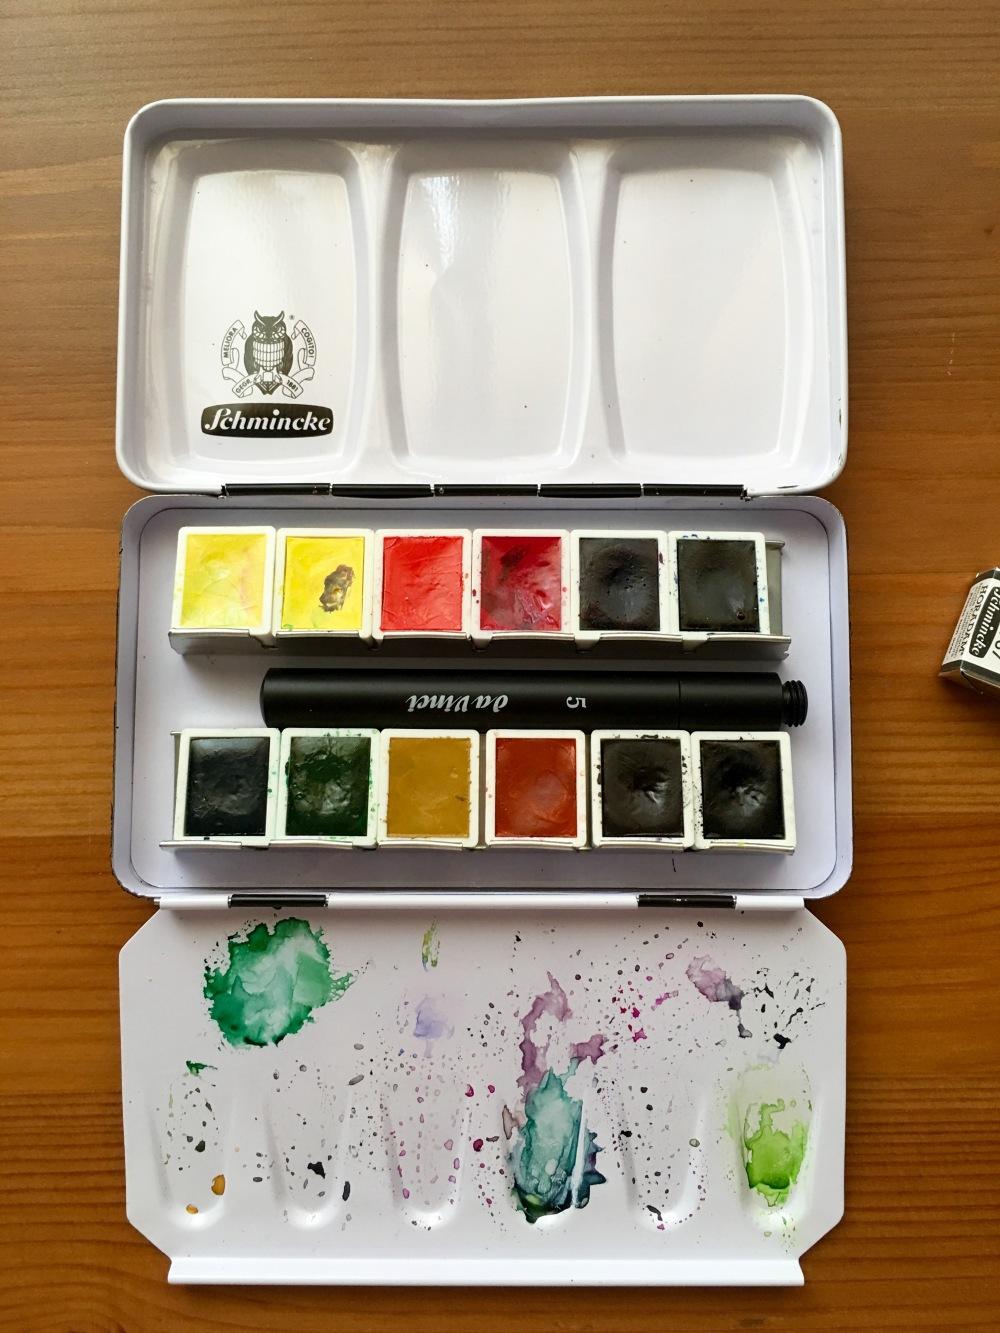 Schmincke metal watercolor travel palette with a da vinci size 5 travel brush